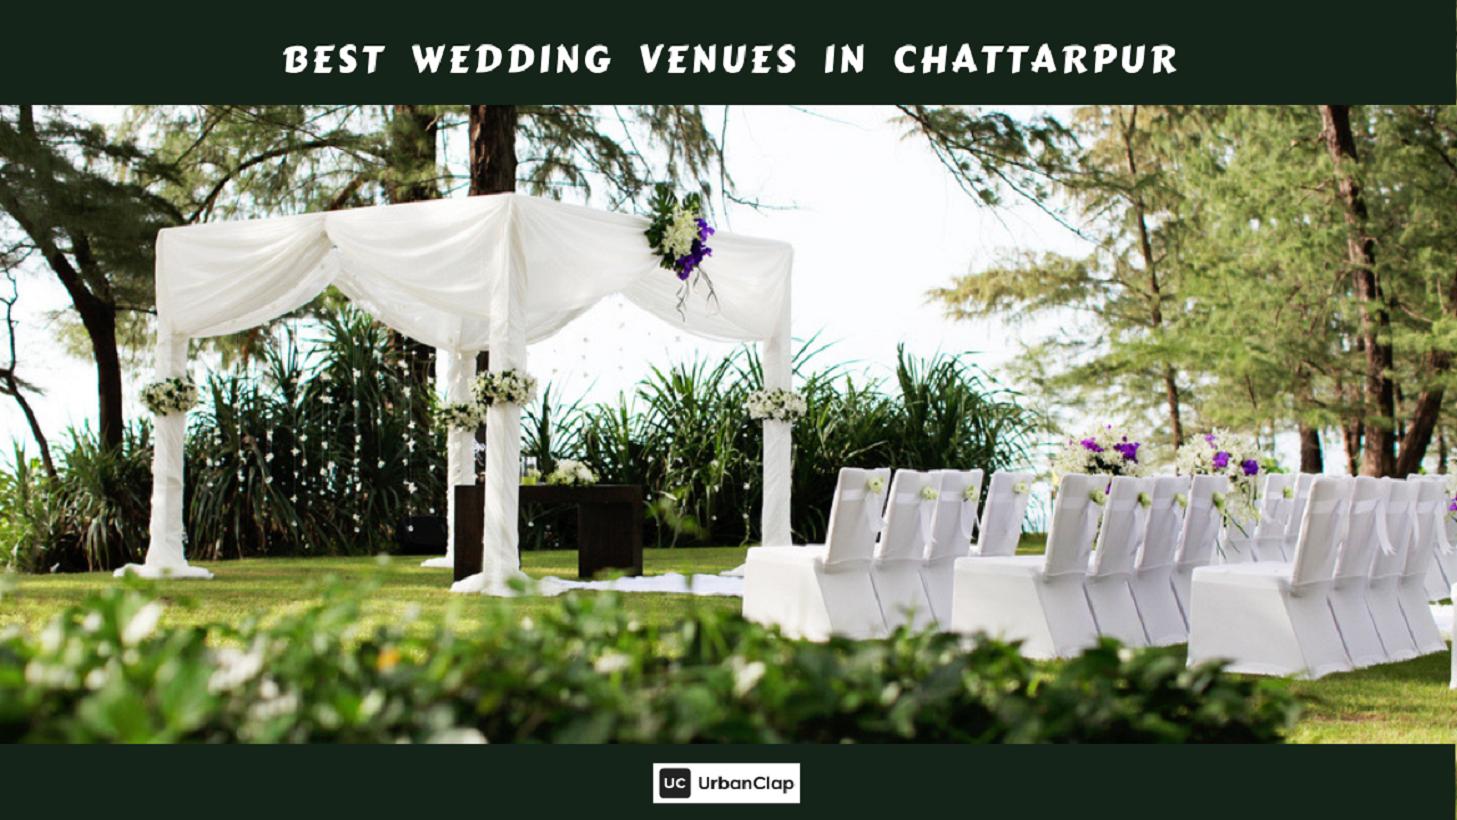 14 Best Wedding Venues In Chattarpur Delhi For Your Dream Wedding